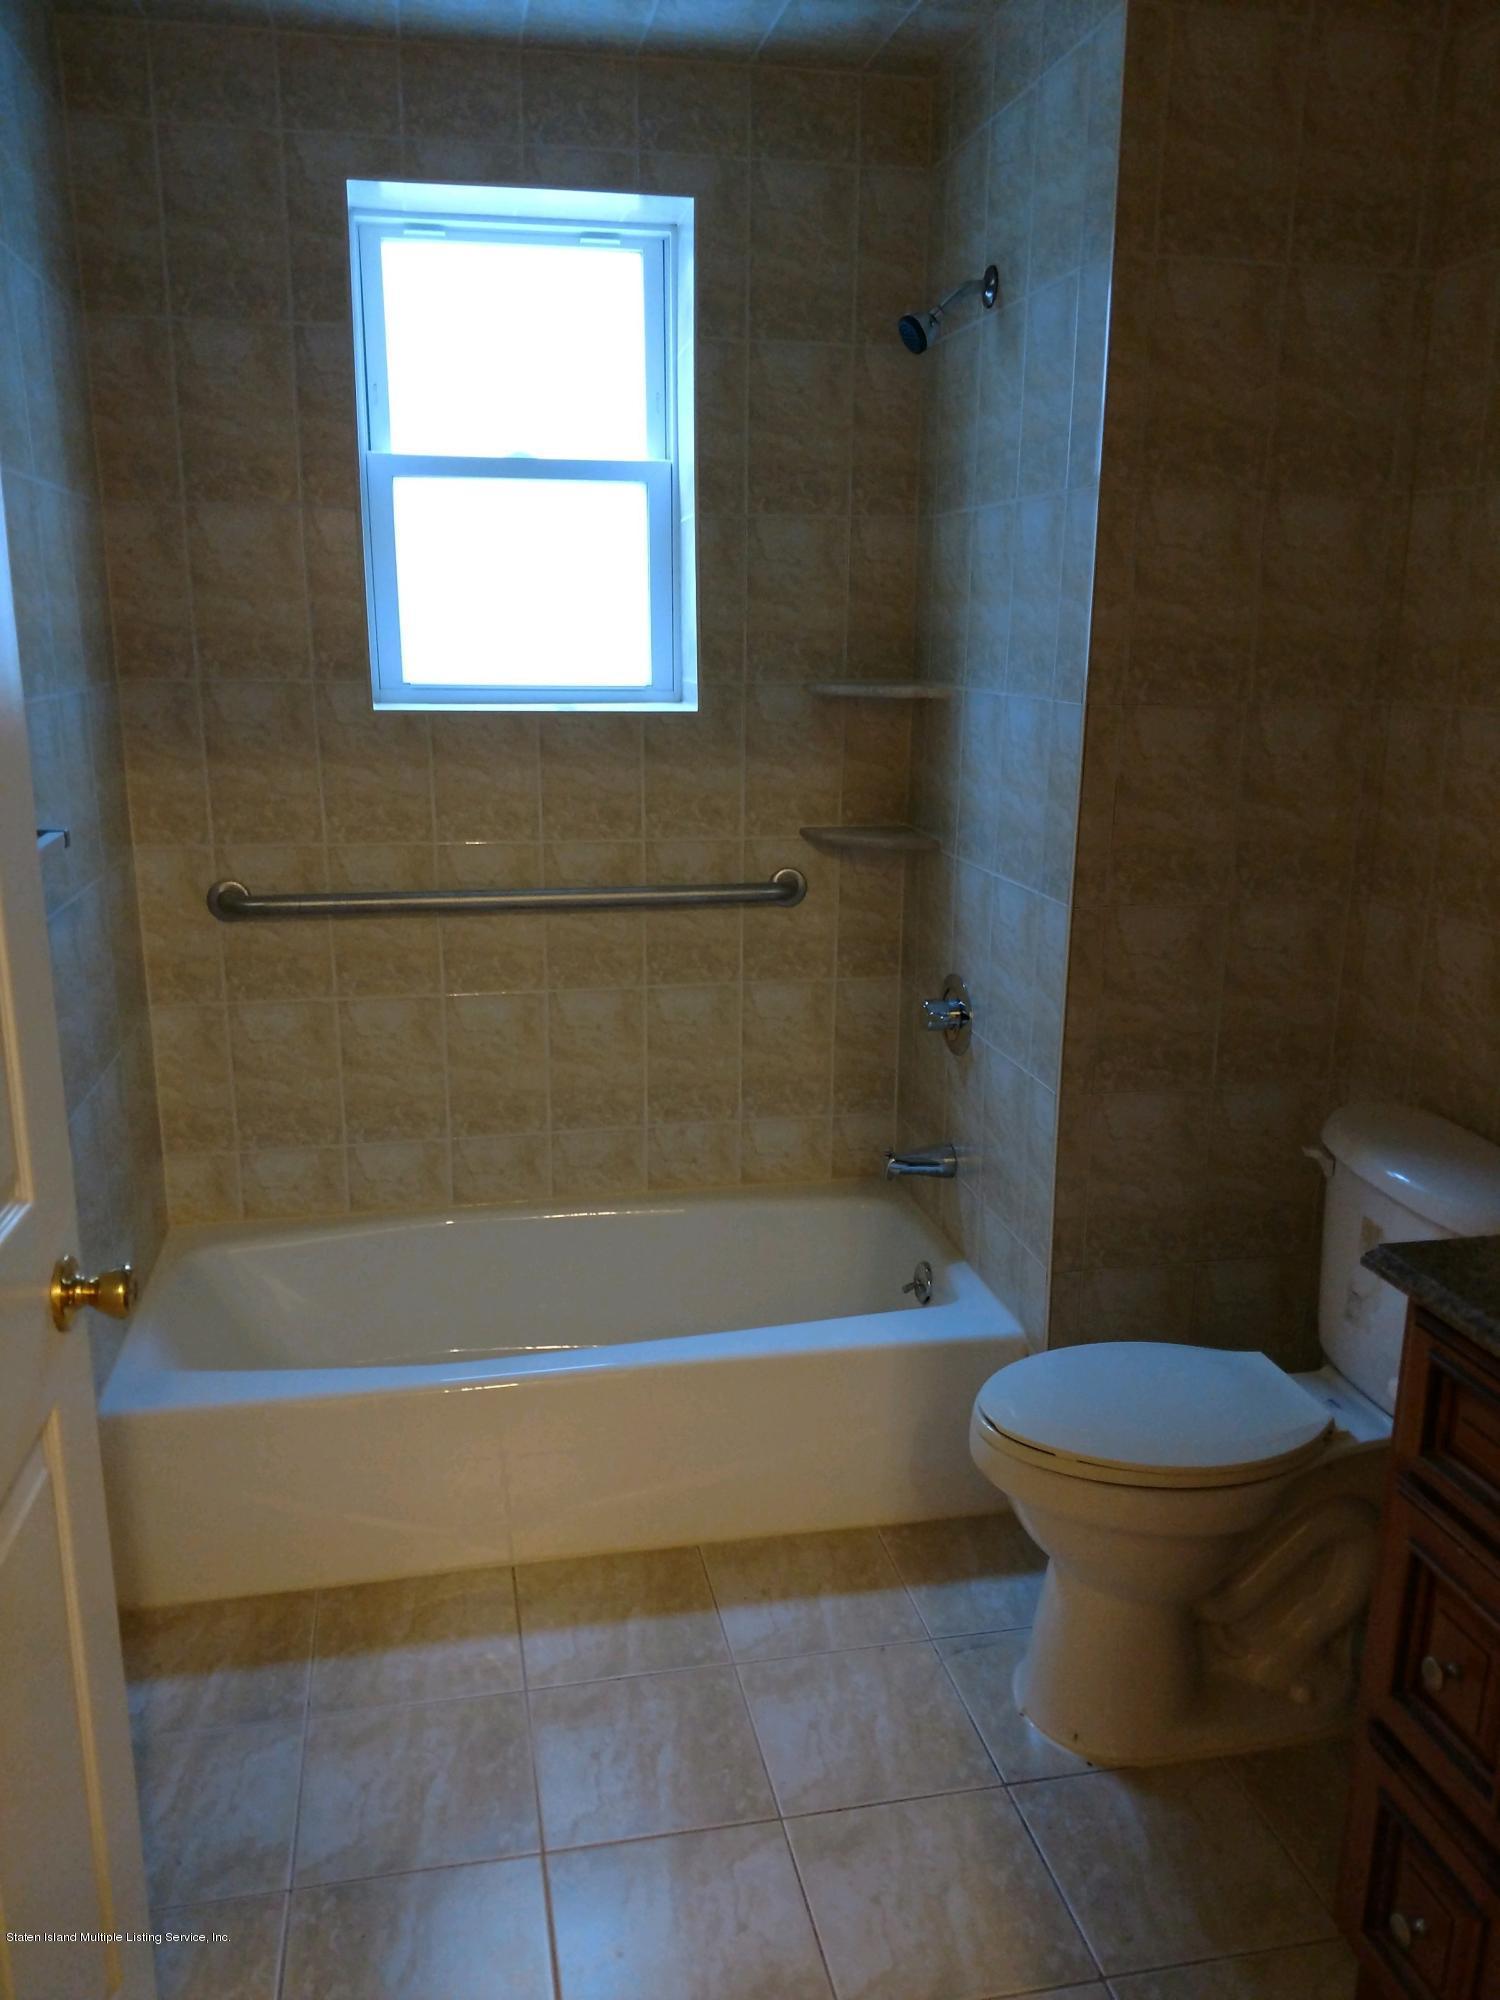 121 Eaton Place,Staten Island,New York,10302,United States,2 Bedrooms Bedrooms,4 Rooms Rooms,1 BathroomBathrooms,Res-Rental,Eaton,1133665